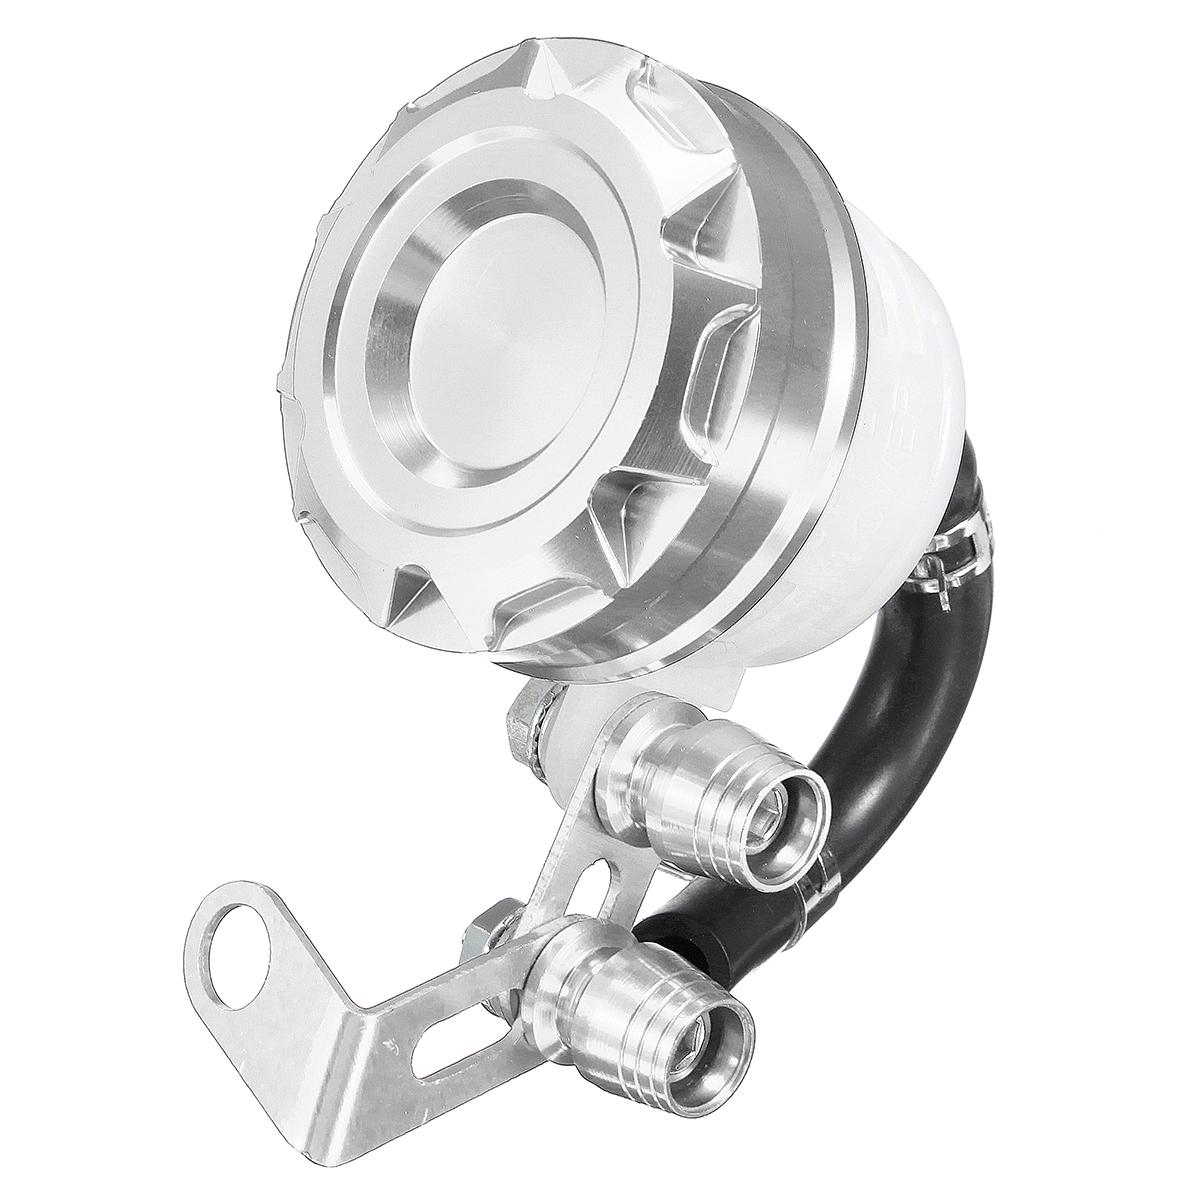 CNC Motorcycle Brake Clutch Cylinder Fluid Oil Reservoir Tank Cup Universal